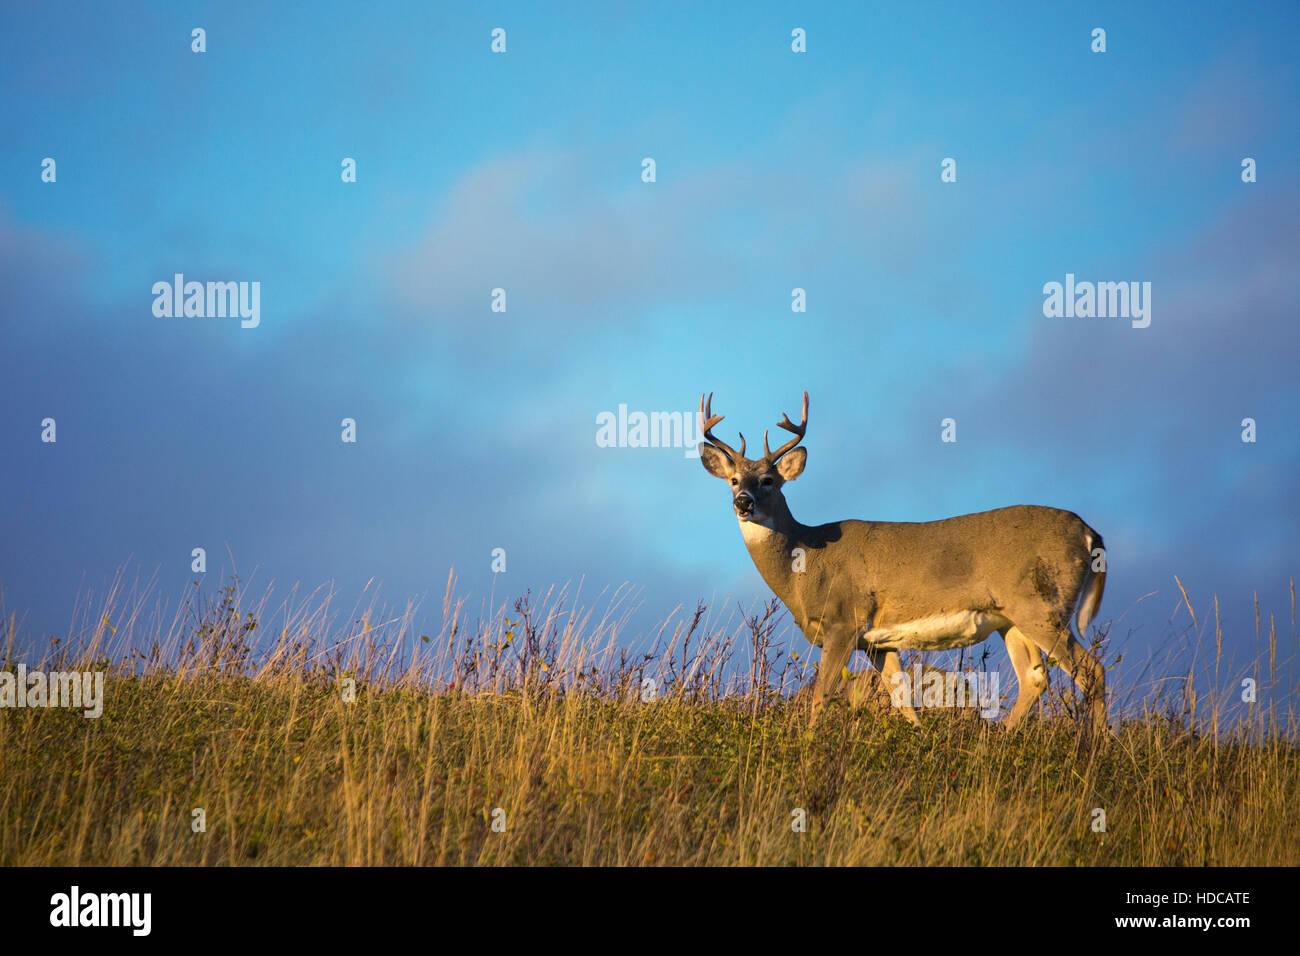 White-tailed Deer buck (Odocoileus virginianus) in Nose Hill park, city of Calgary. - Stock Image